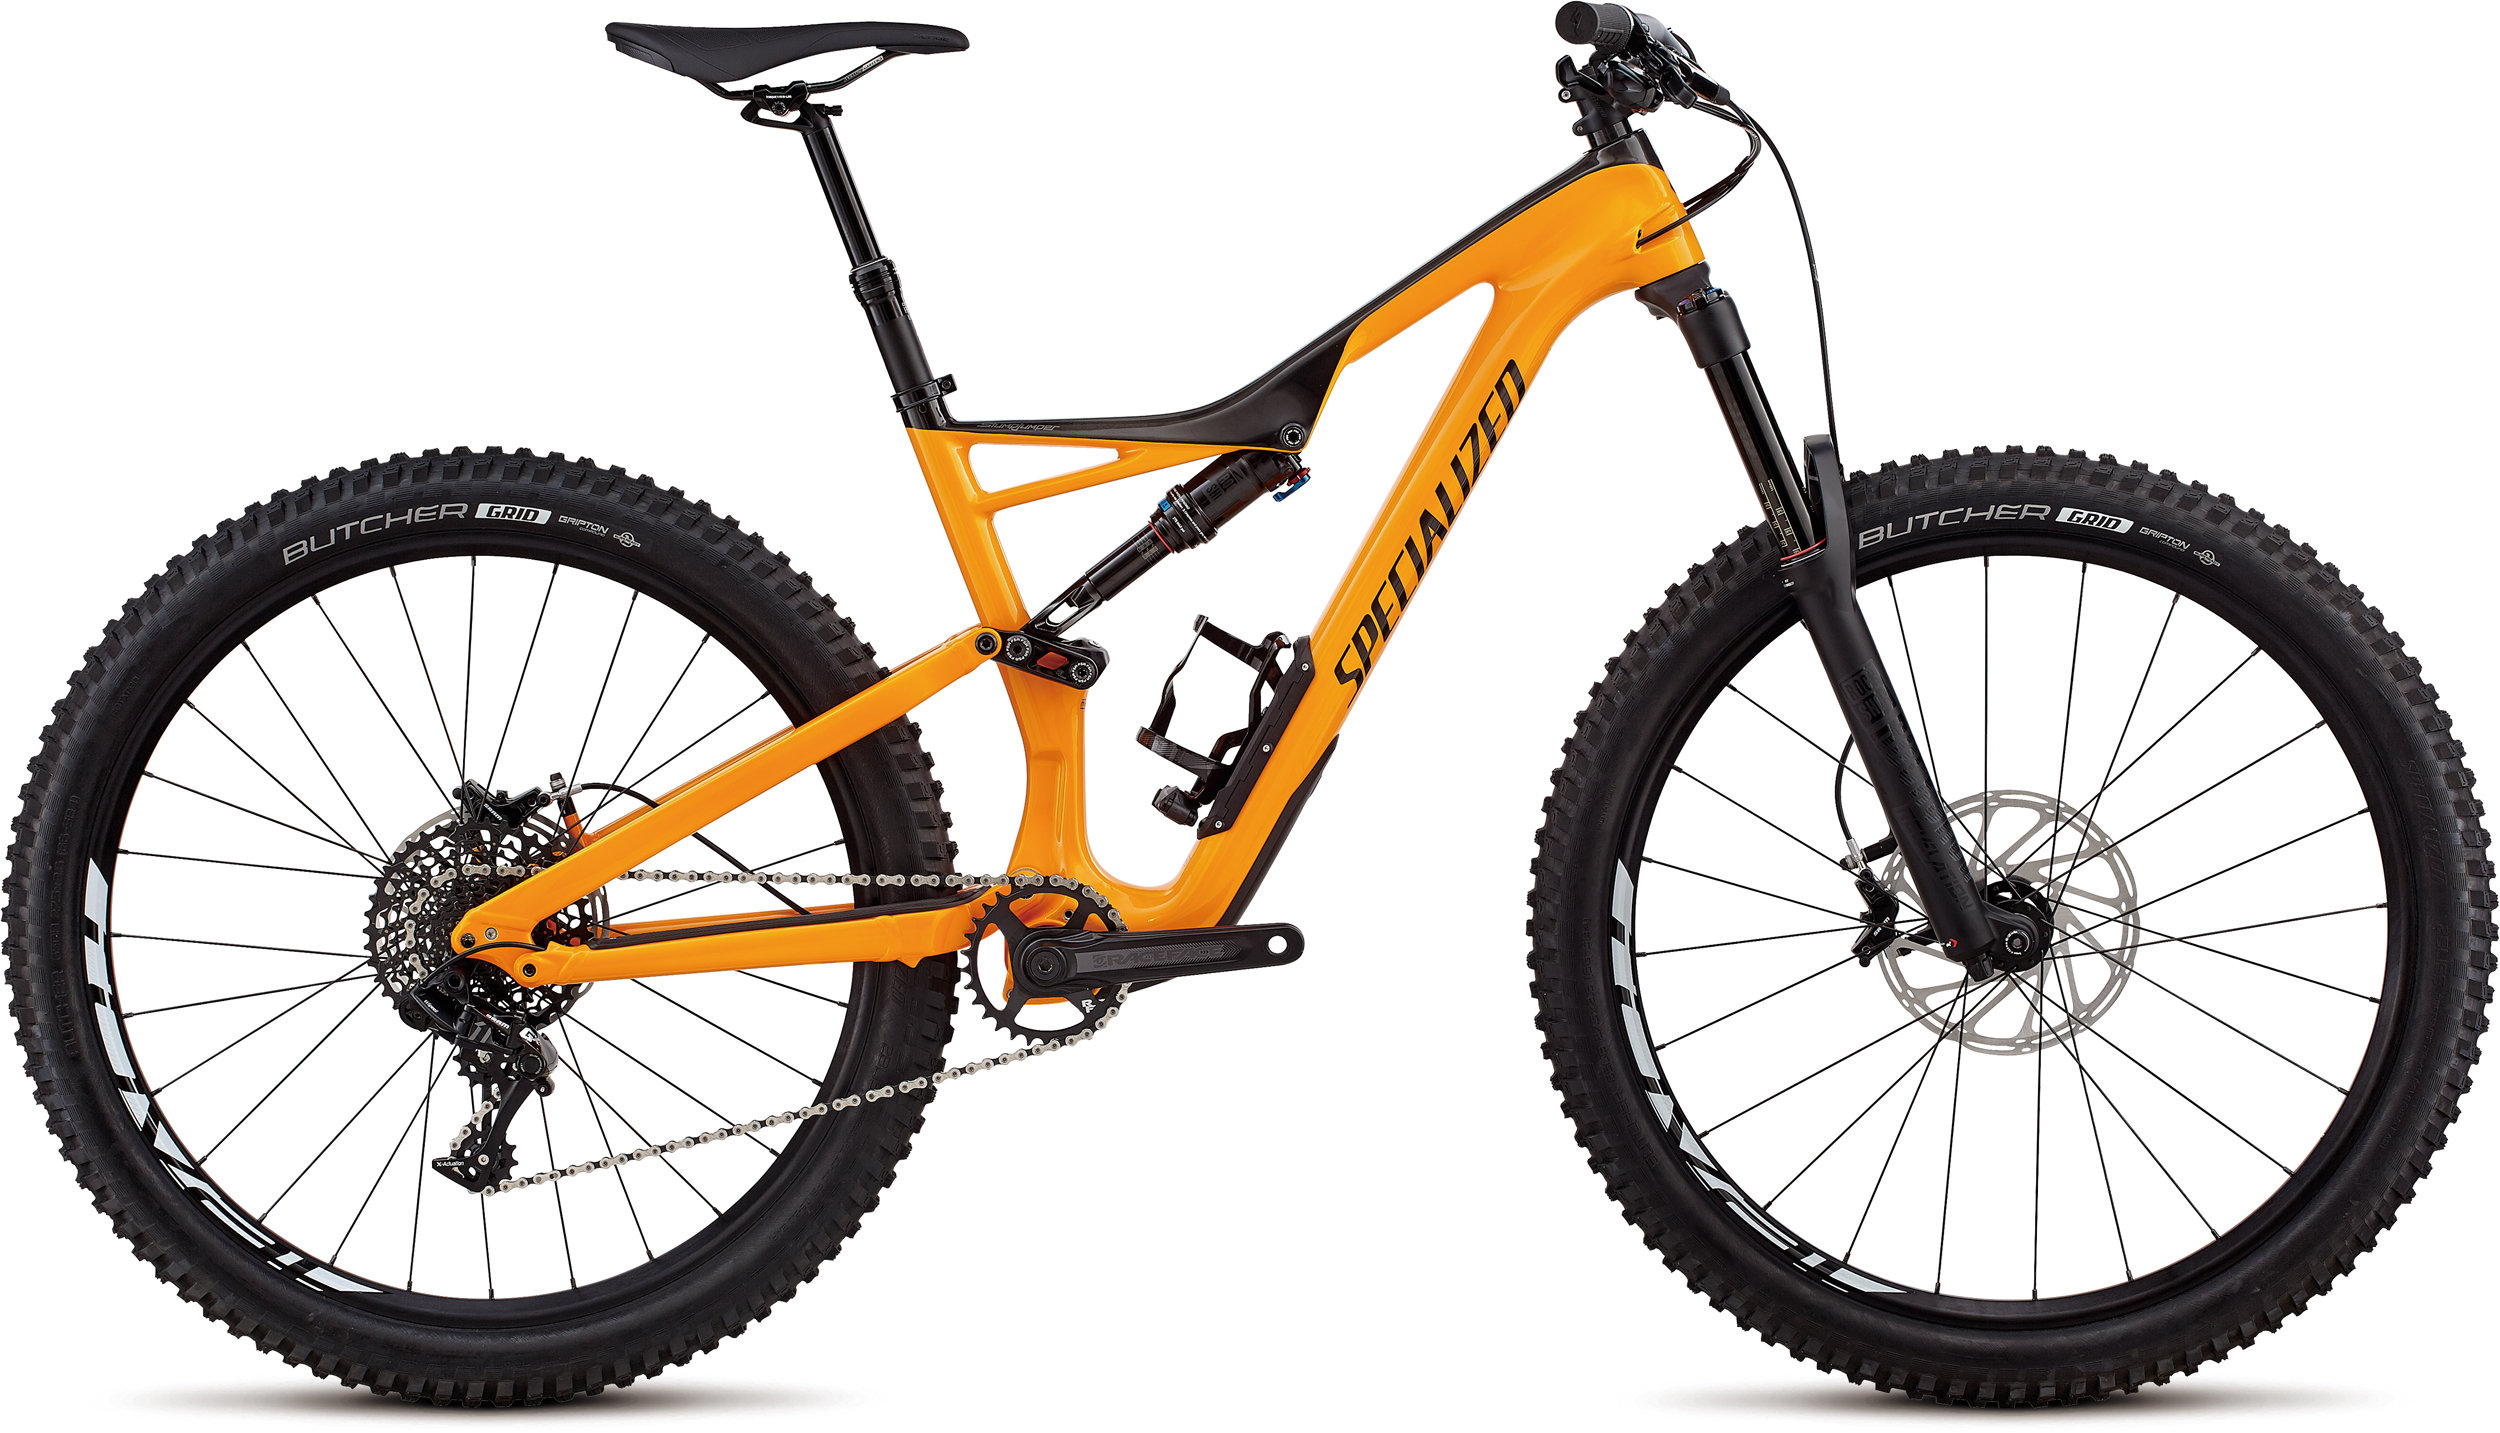 Specialized Stumpjumper Comp Carbon 27.5 GLOSS GALLARDO ORANGE / CARBON / BLACK S - Bike Maniac